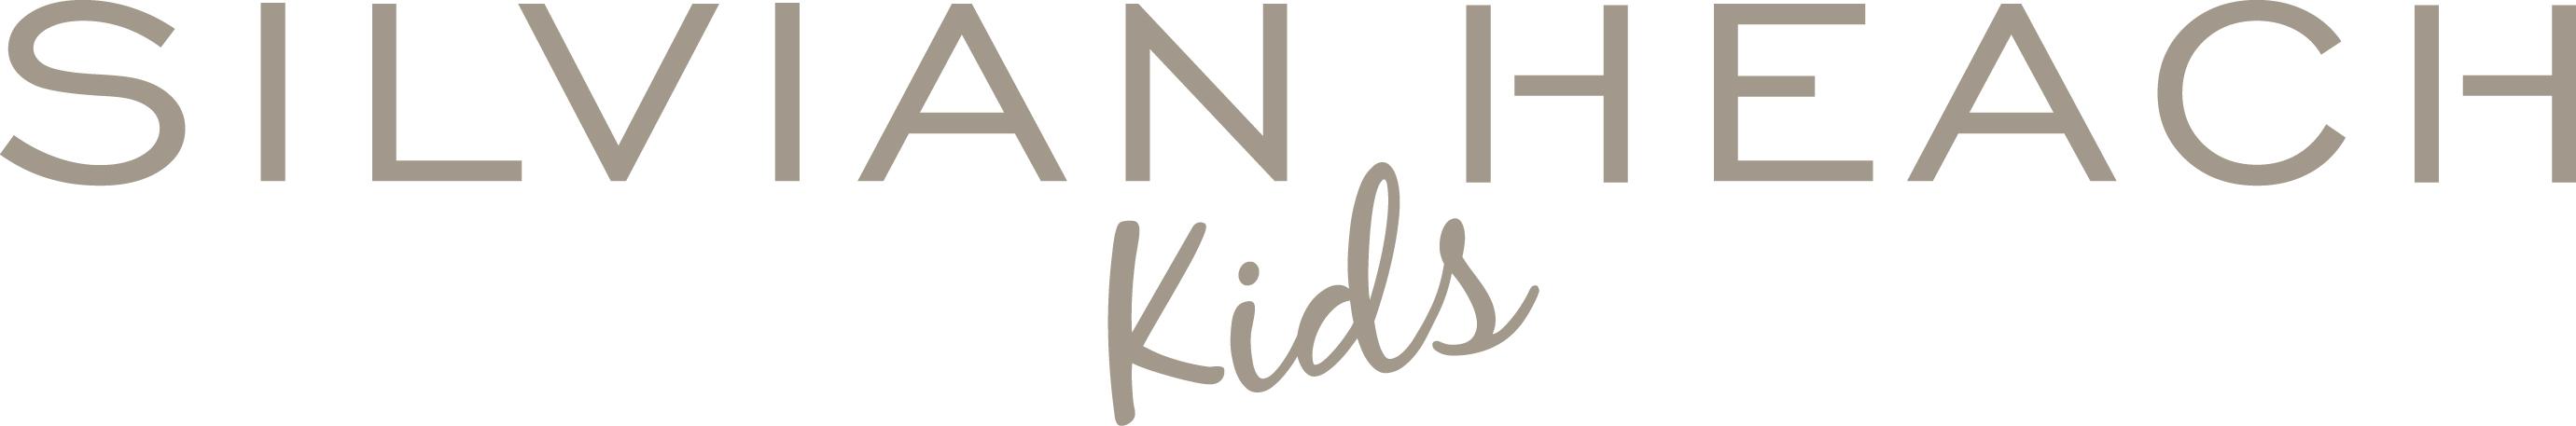 SILVIAN_HEACH_KIDS_logo_positivo